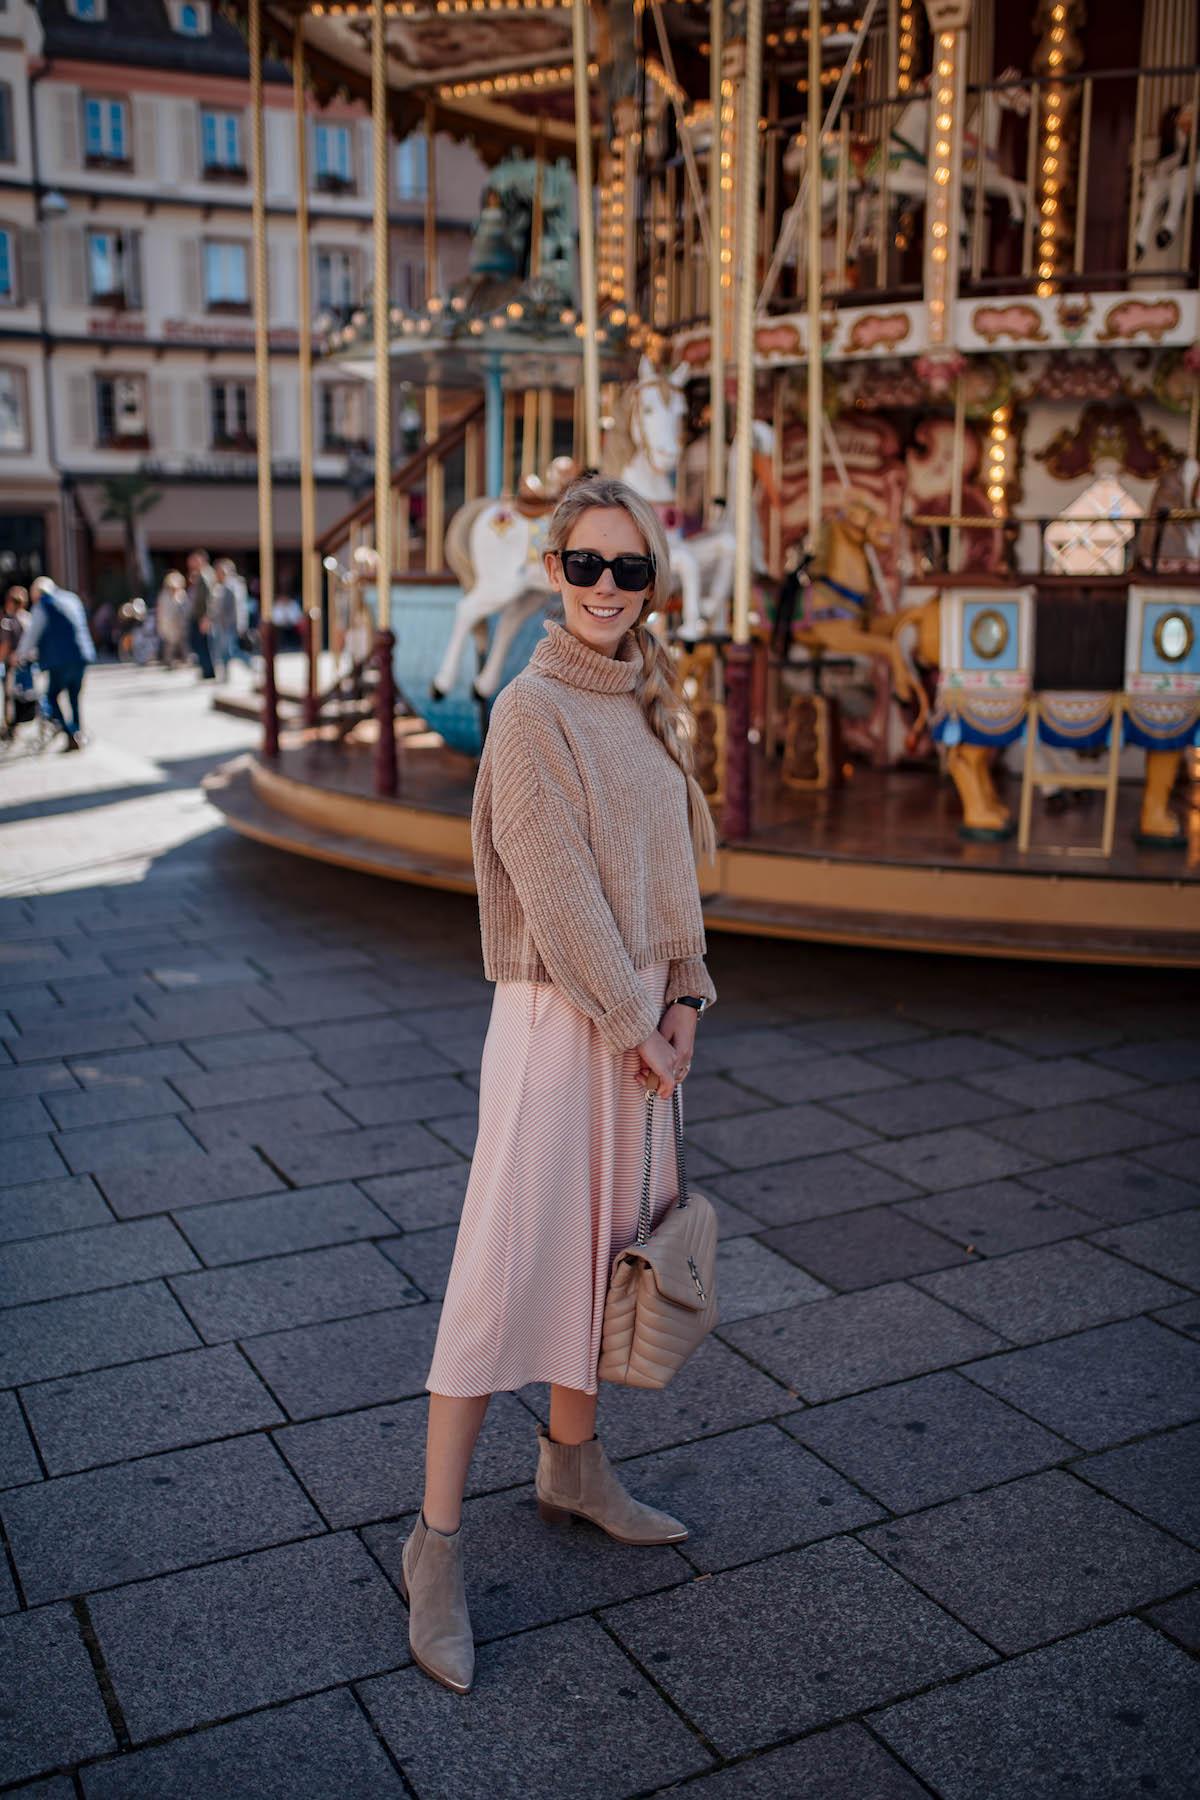 Strasbourg Carousel